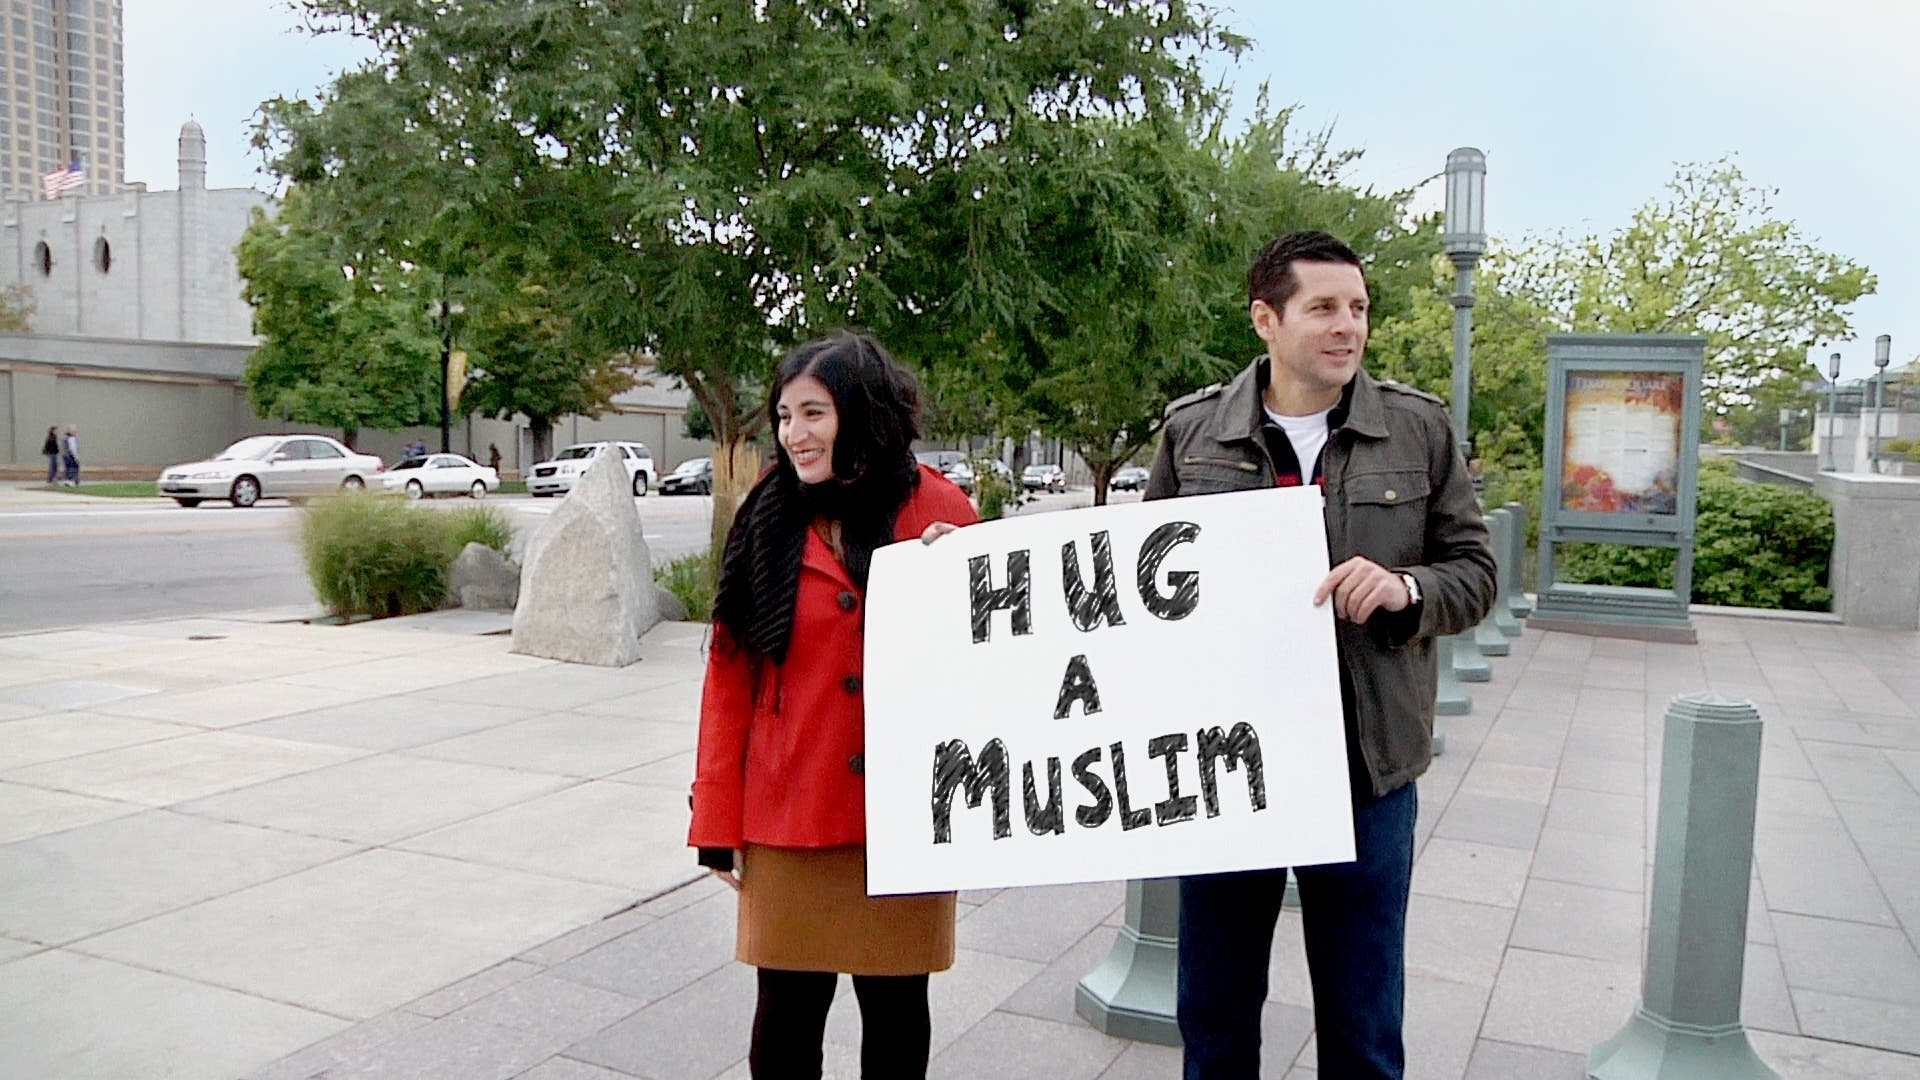 Awareness in the community. (Photo courtesy: muslimsarecoming.com)